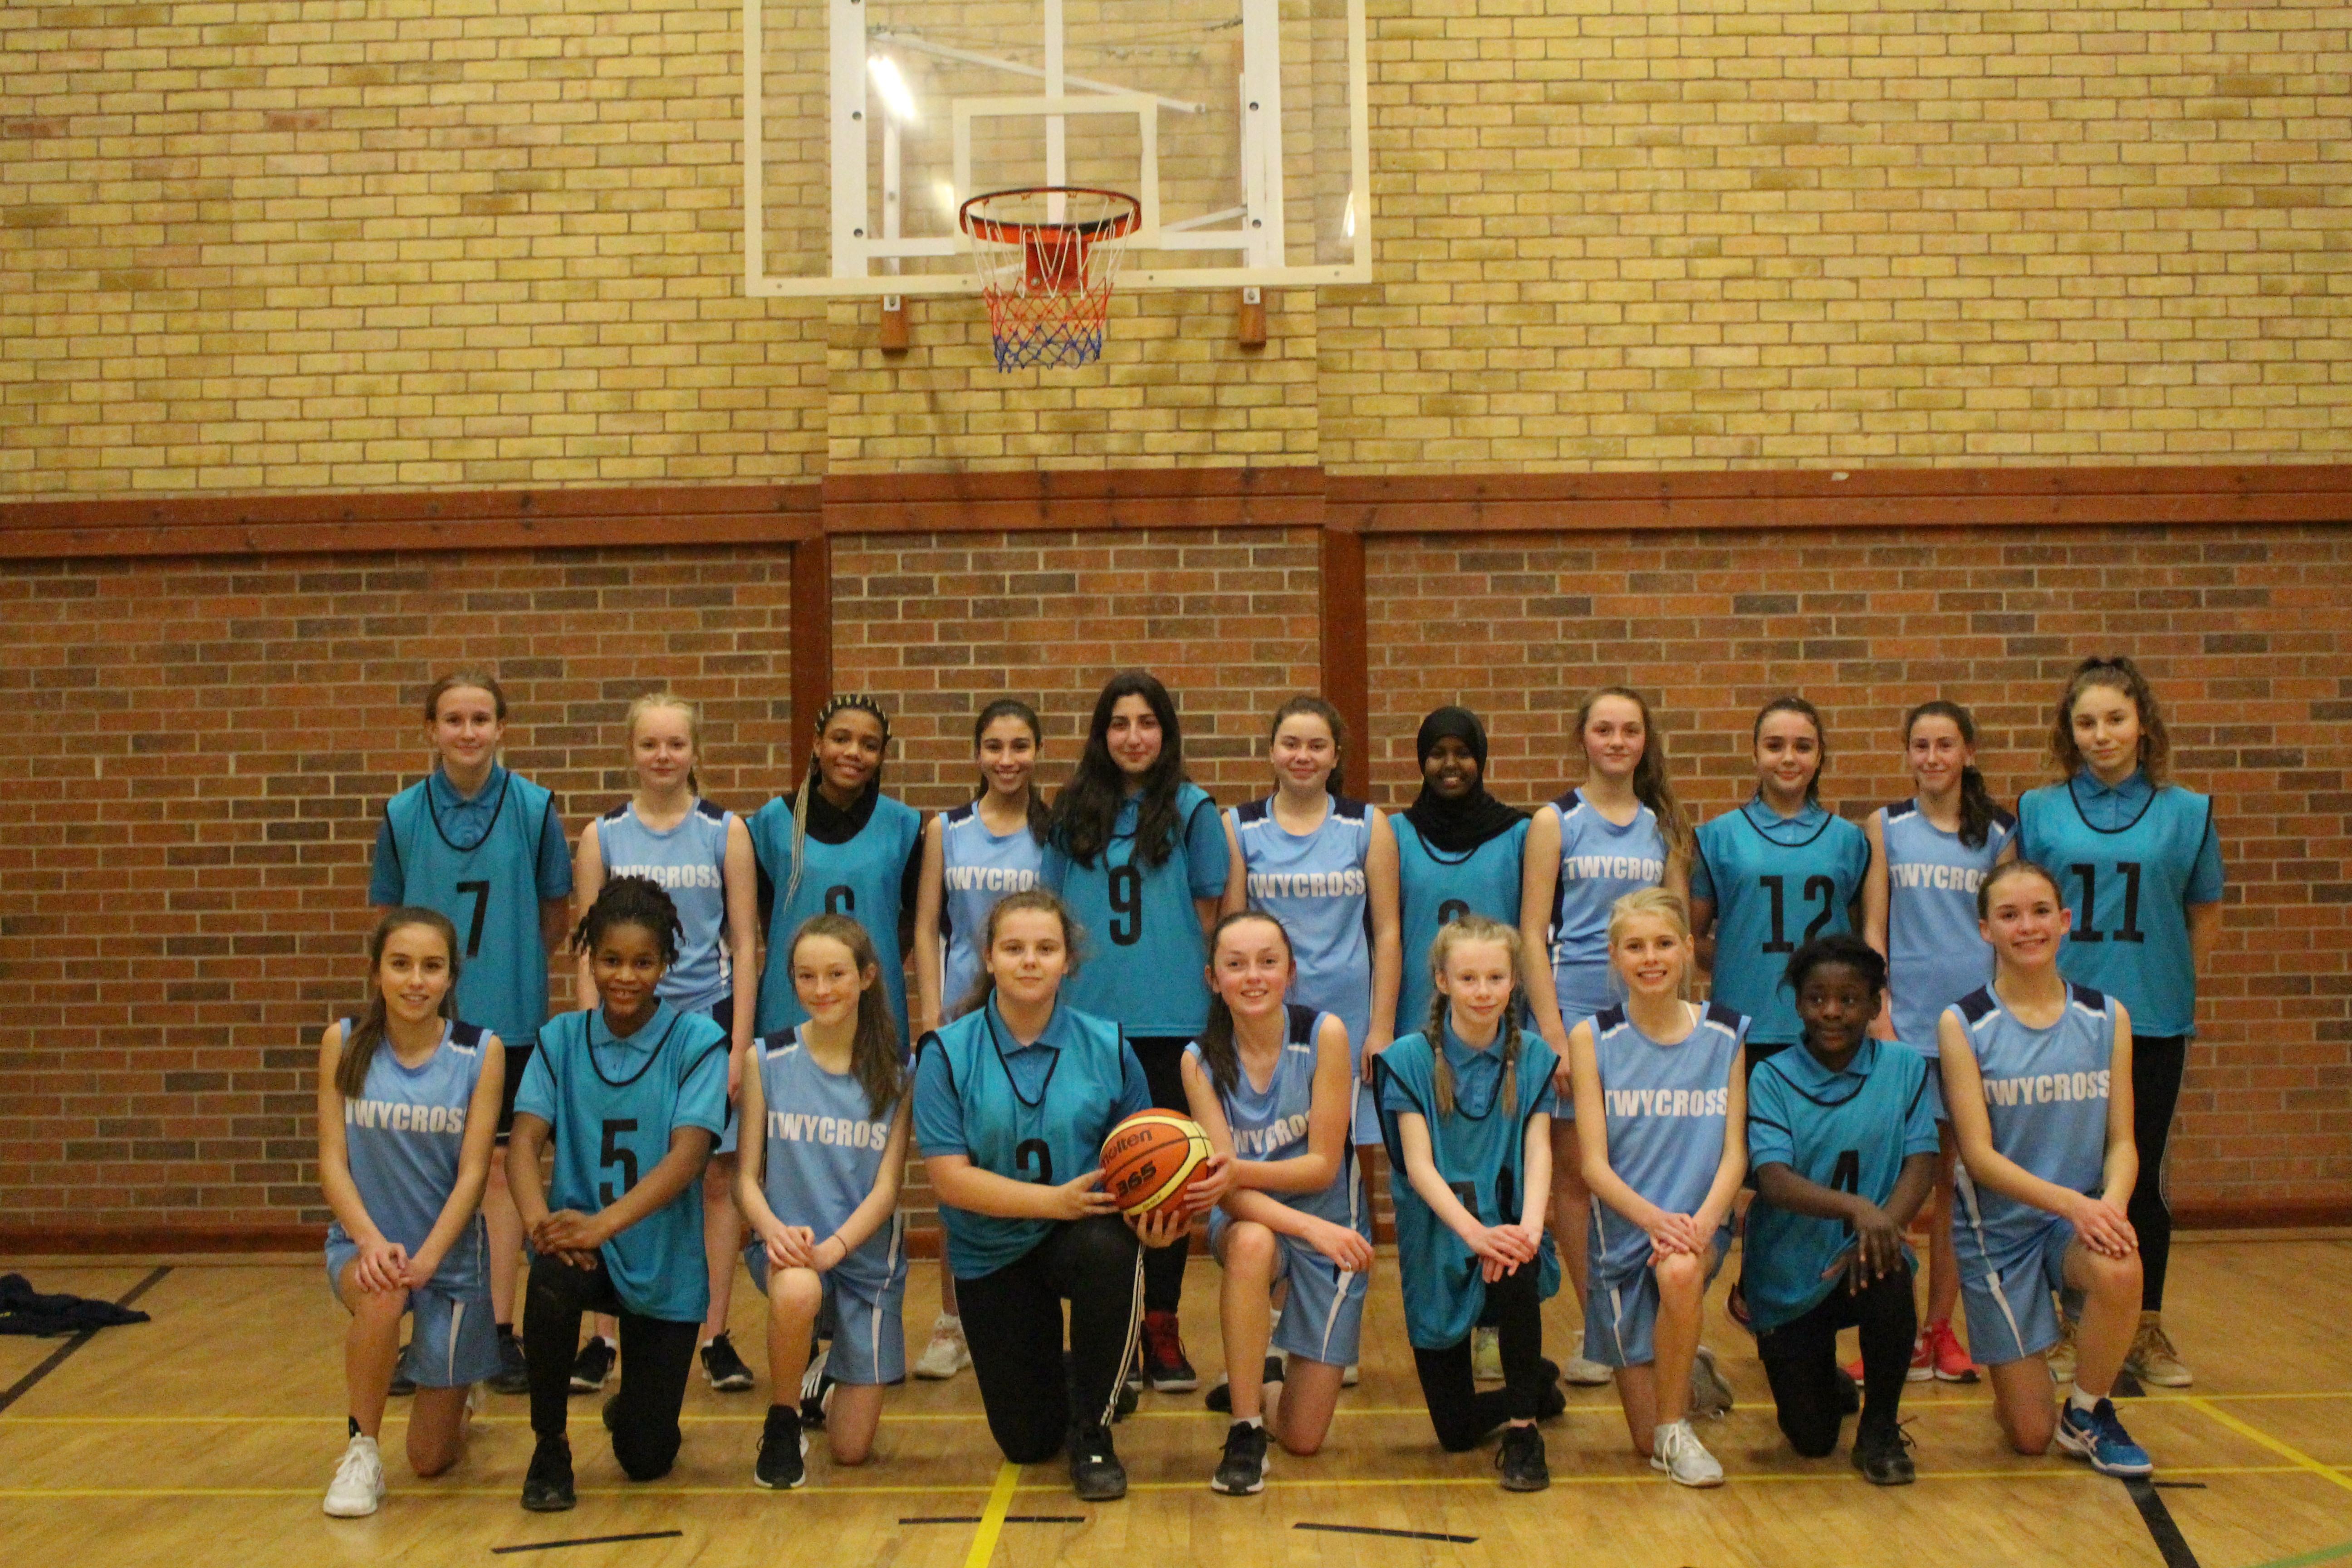 Girls Basketball win 38-36 against Twycross House School!